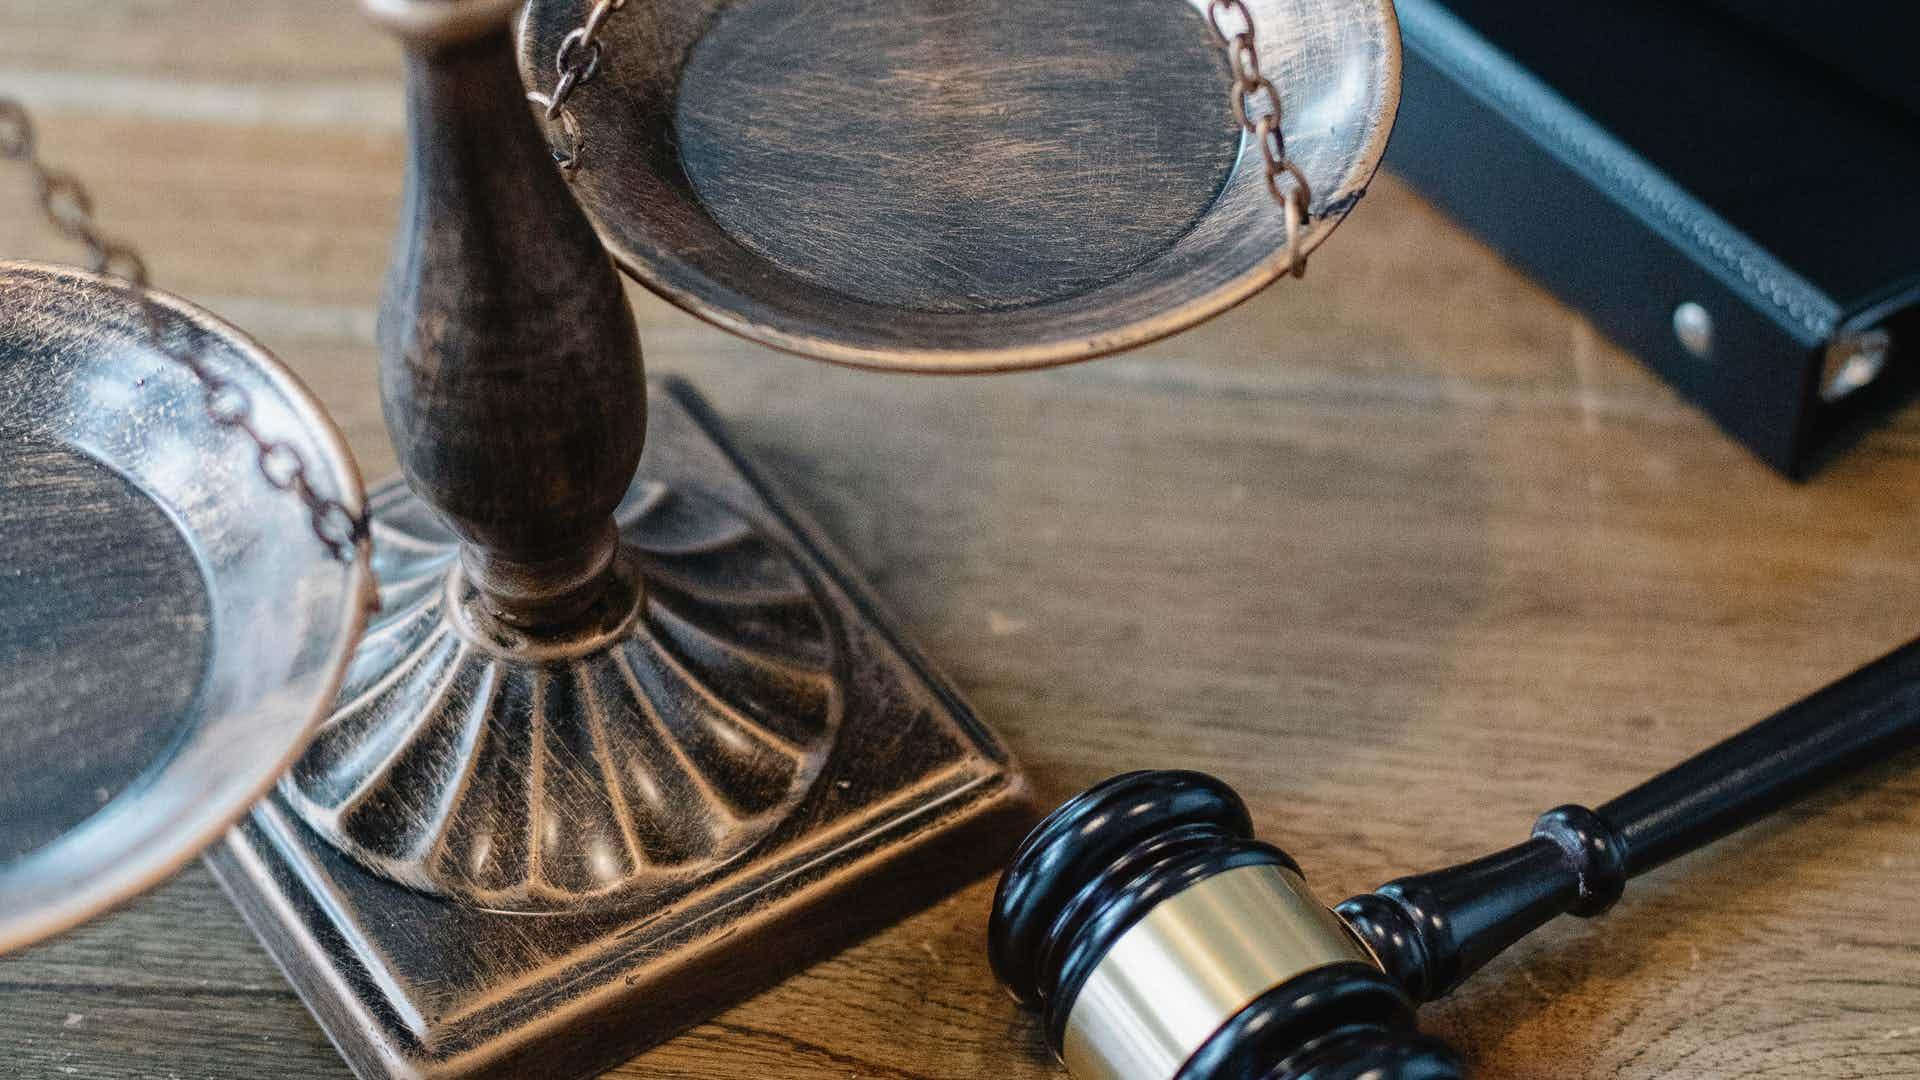 Onrechtmatige daad advocaat